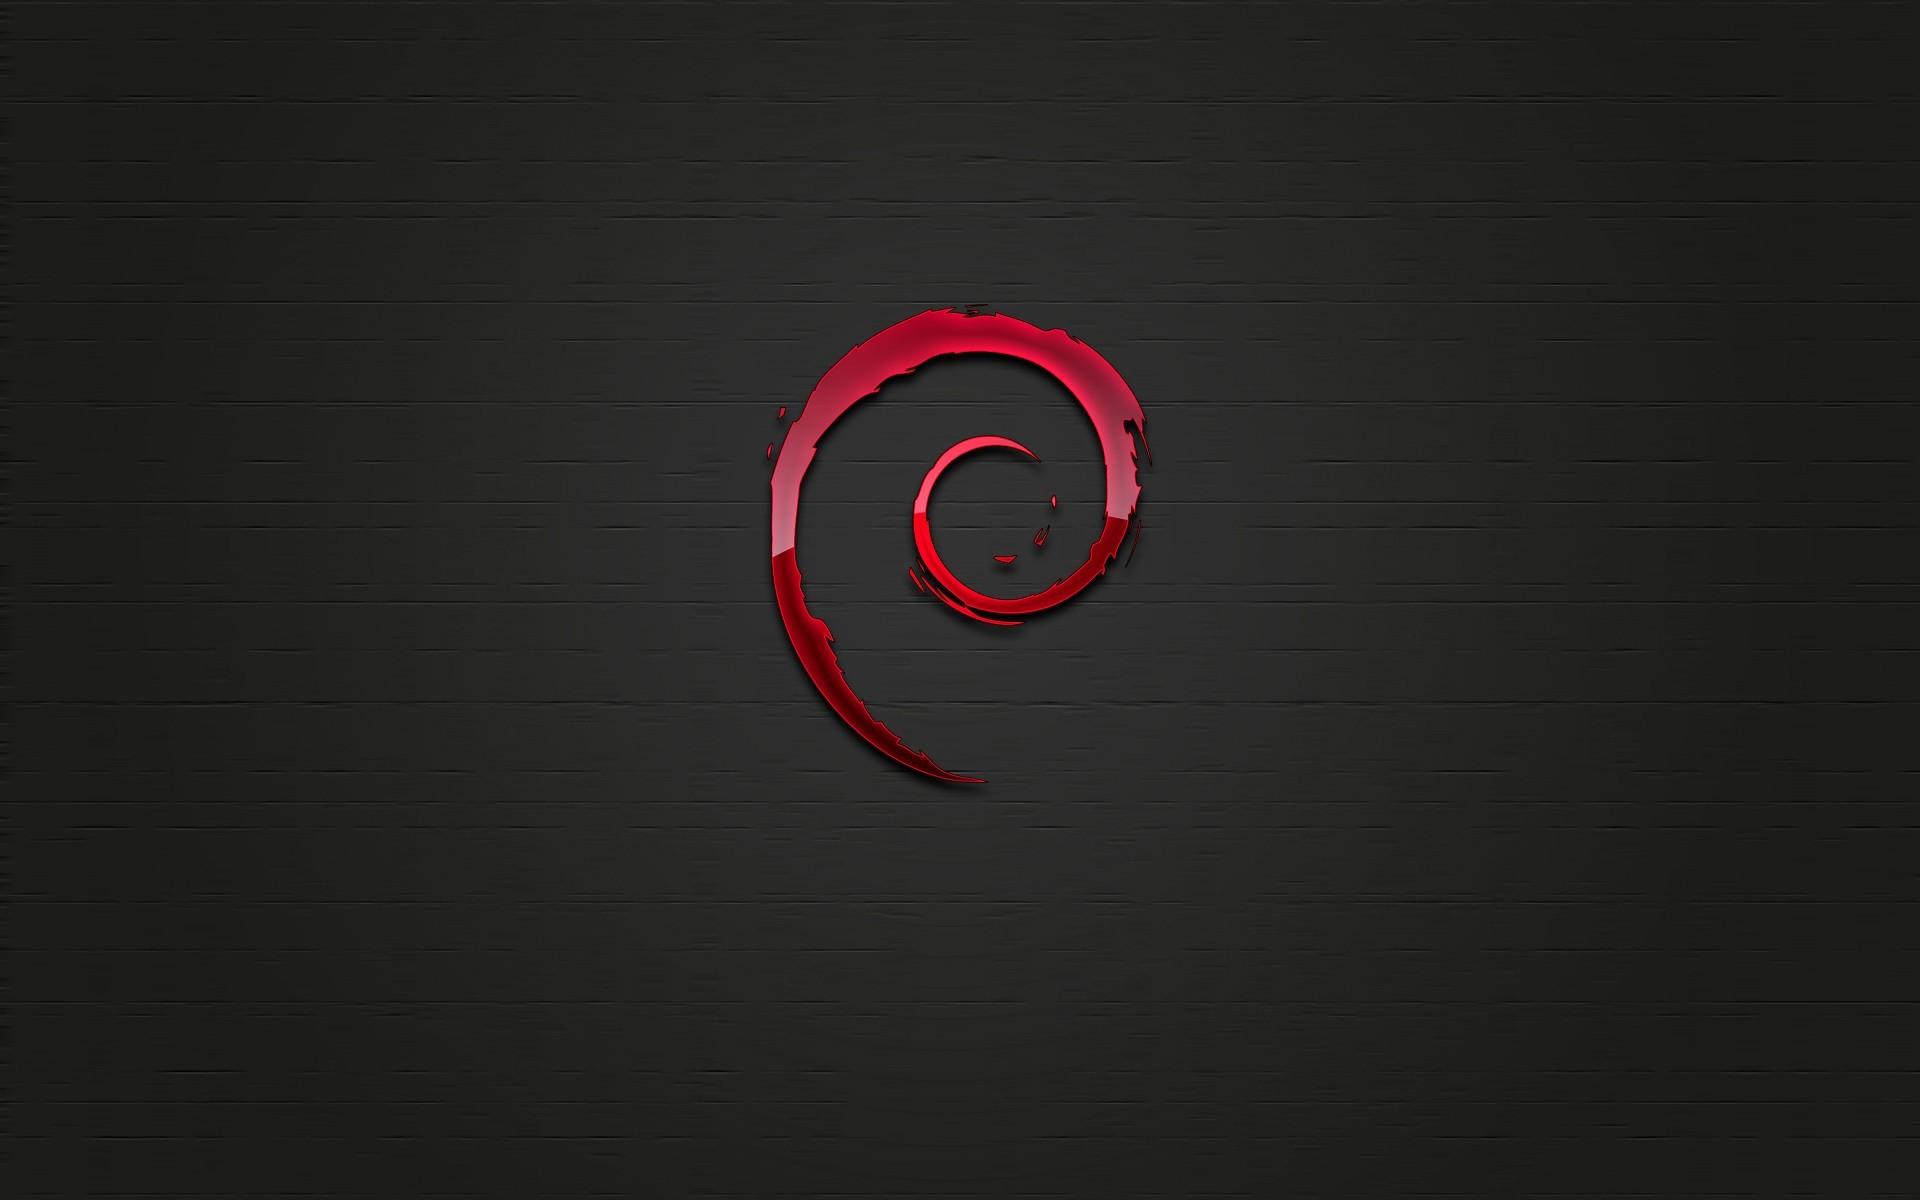 Kali Linux Wallpaper HD (69+ images)